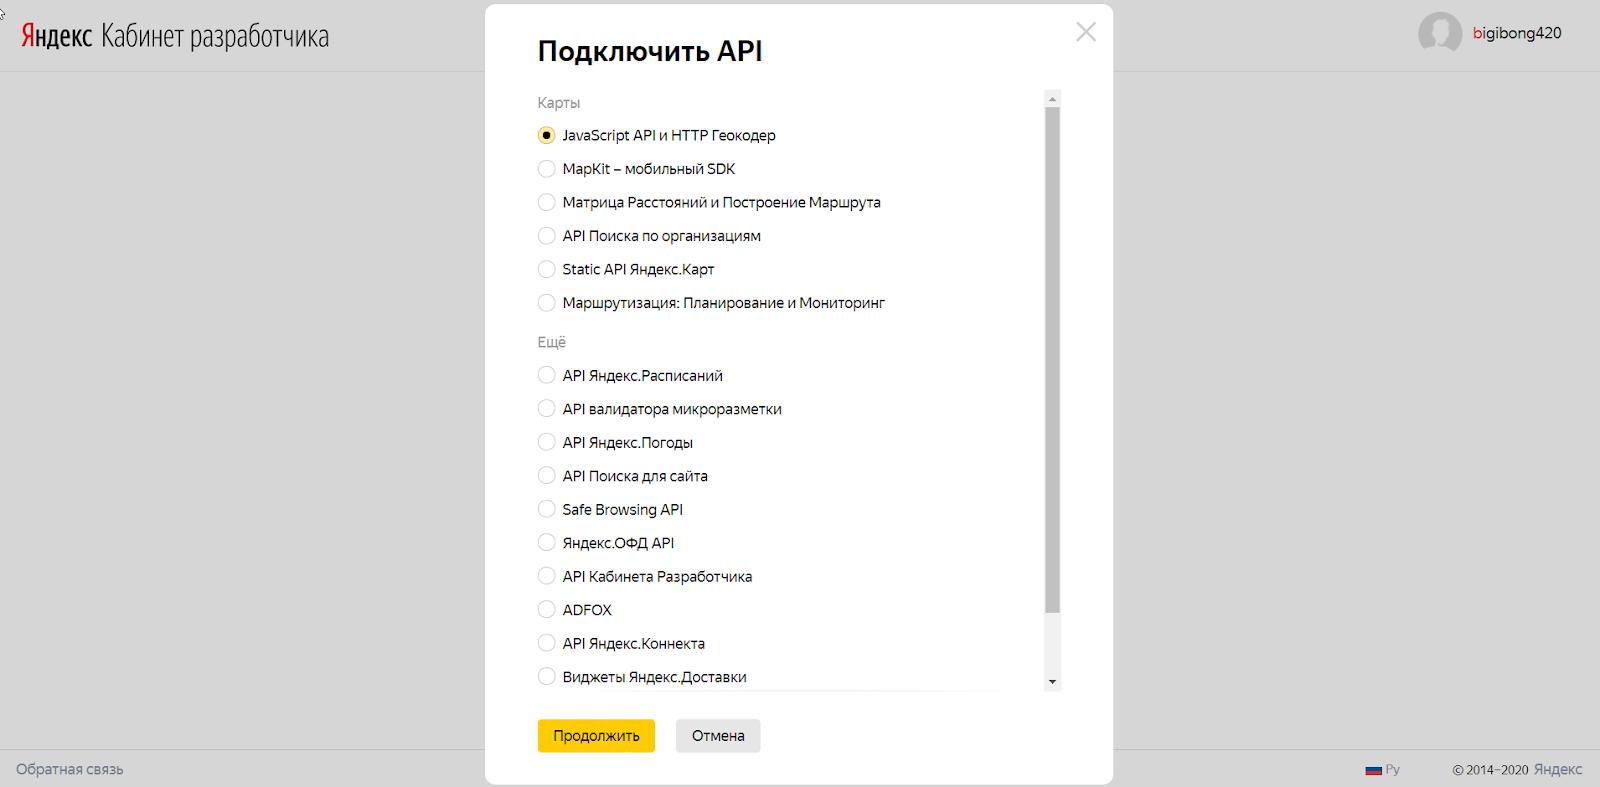 JavaScript API и HTTP Геокодер